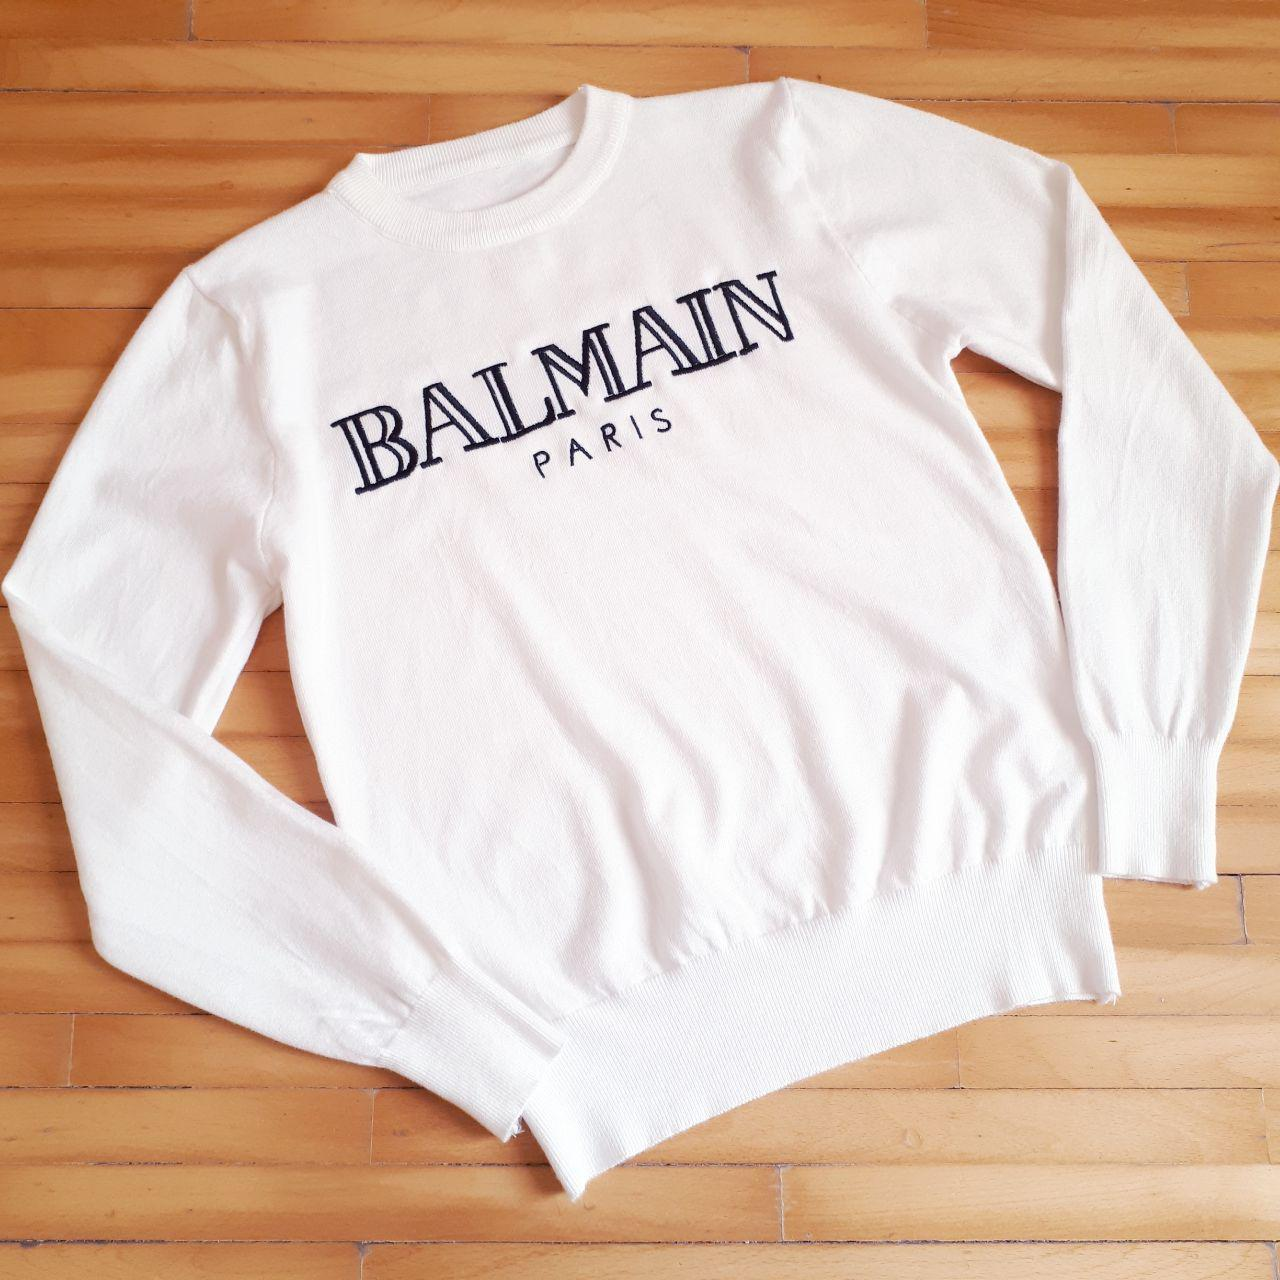 Свитер Balmain  белый, фото 1